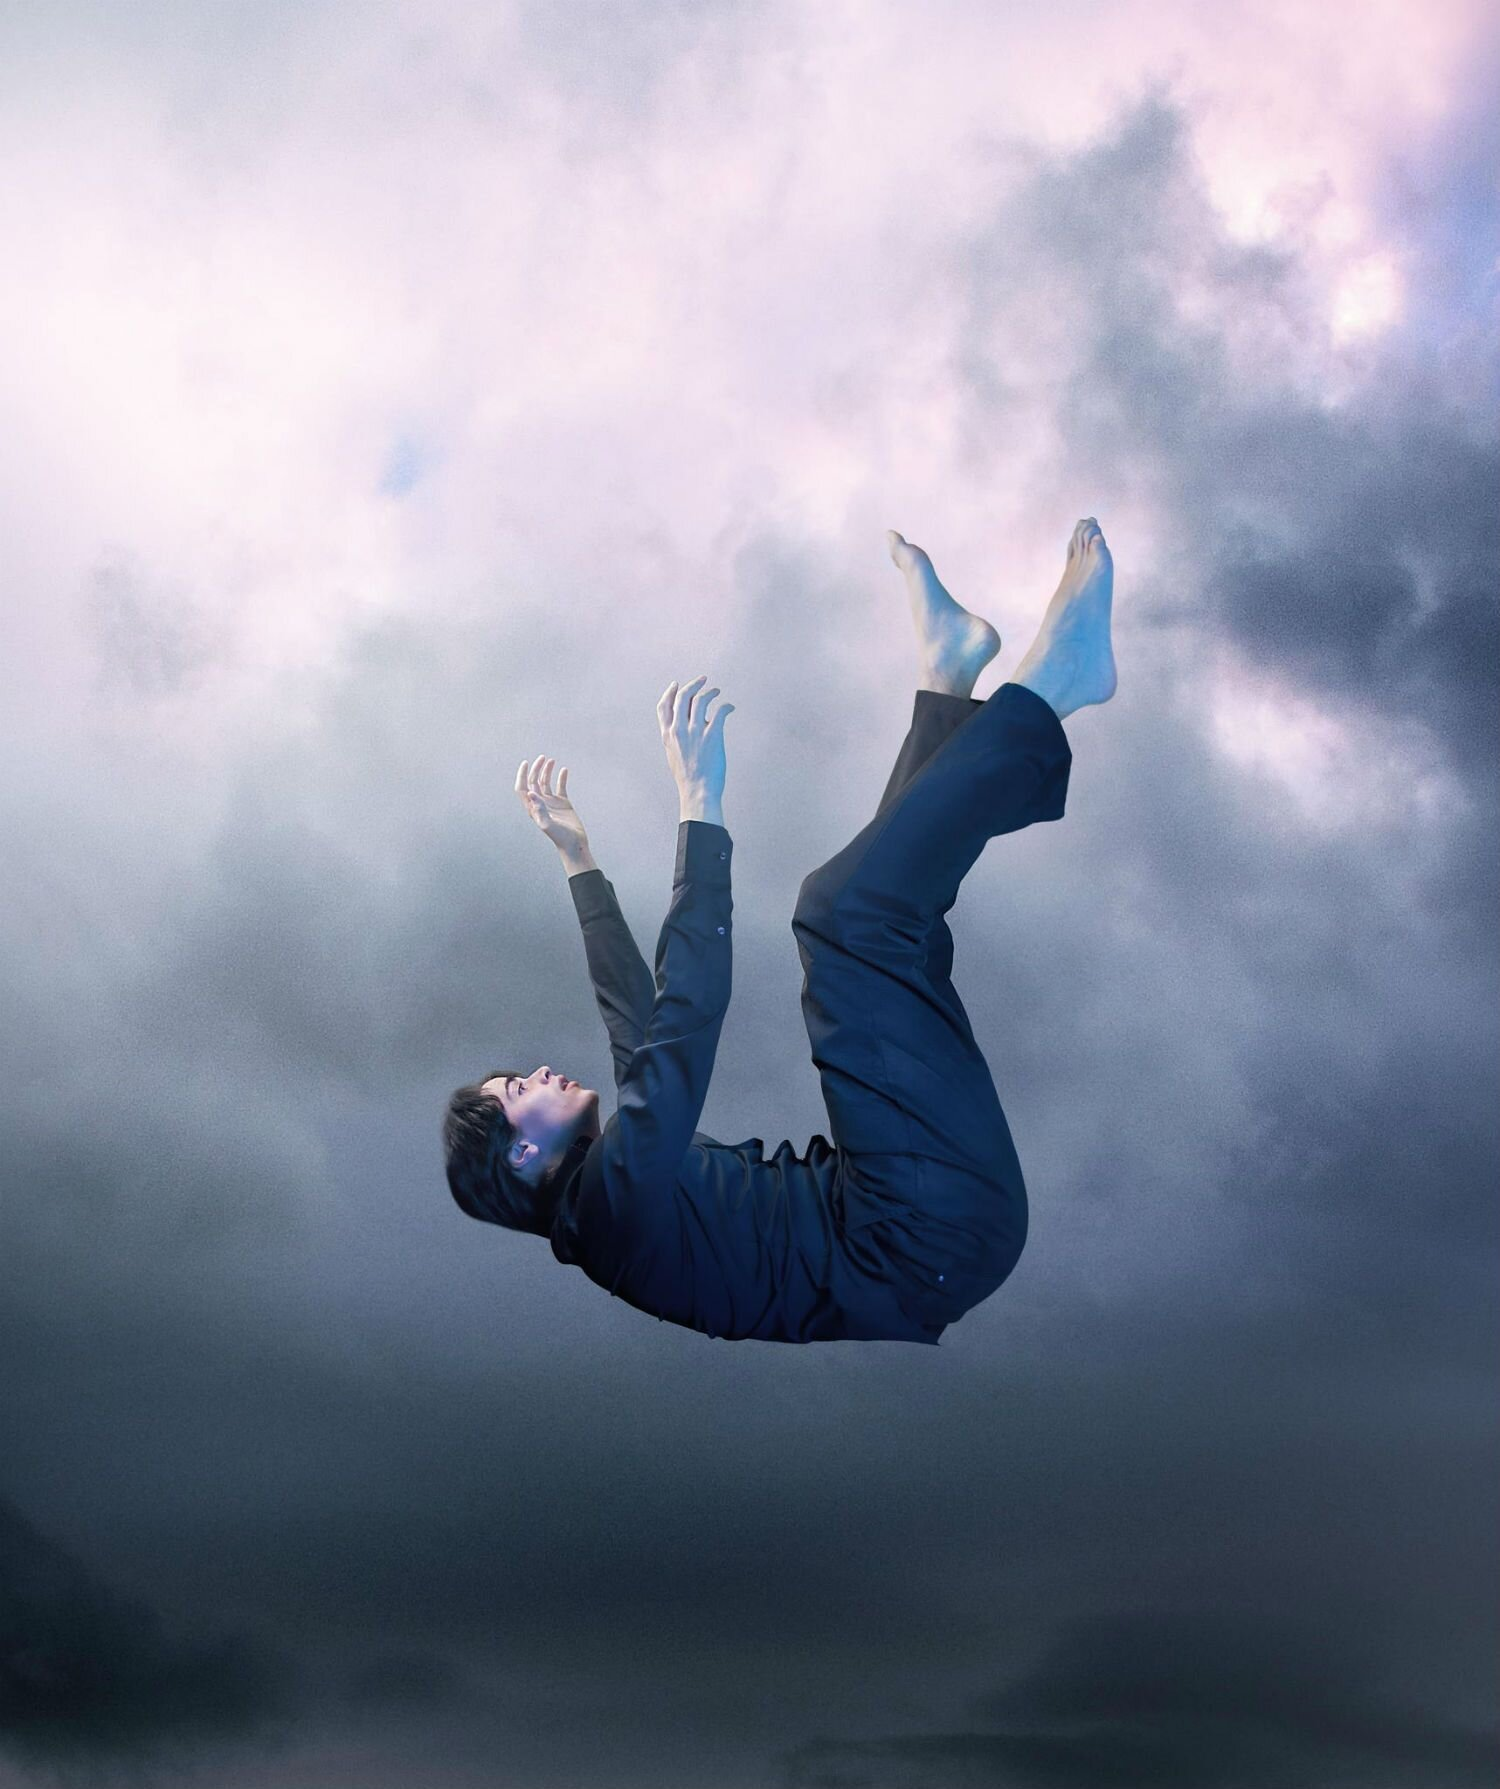 Falling dream.jpg